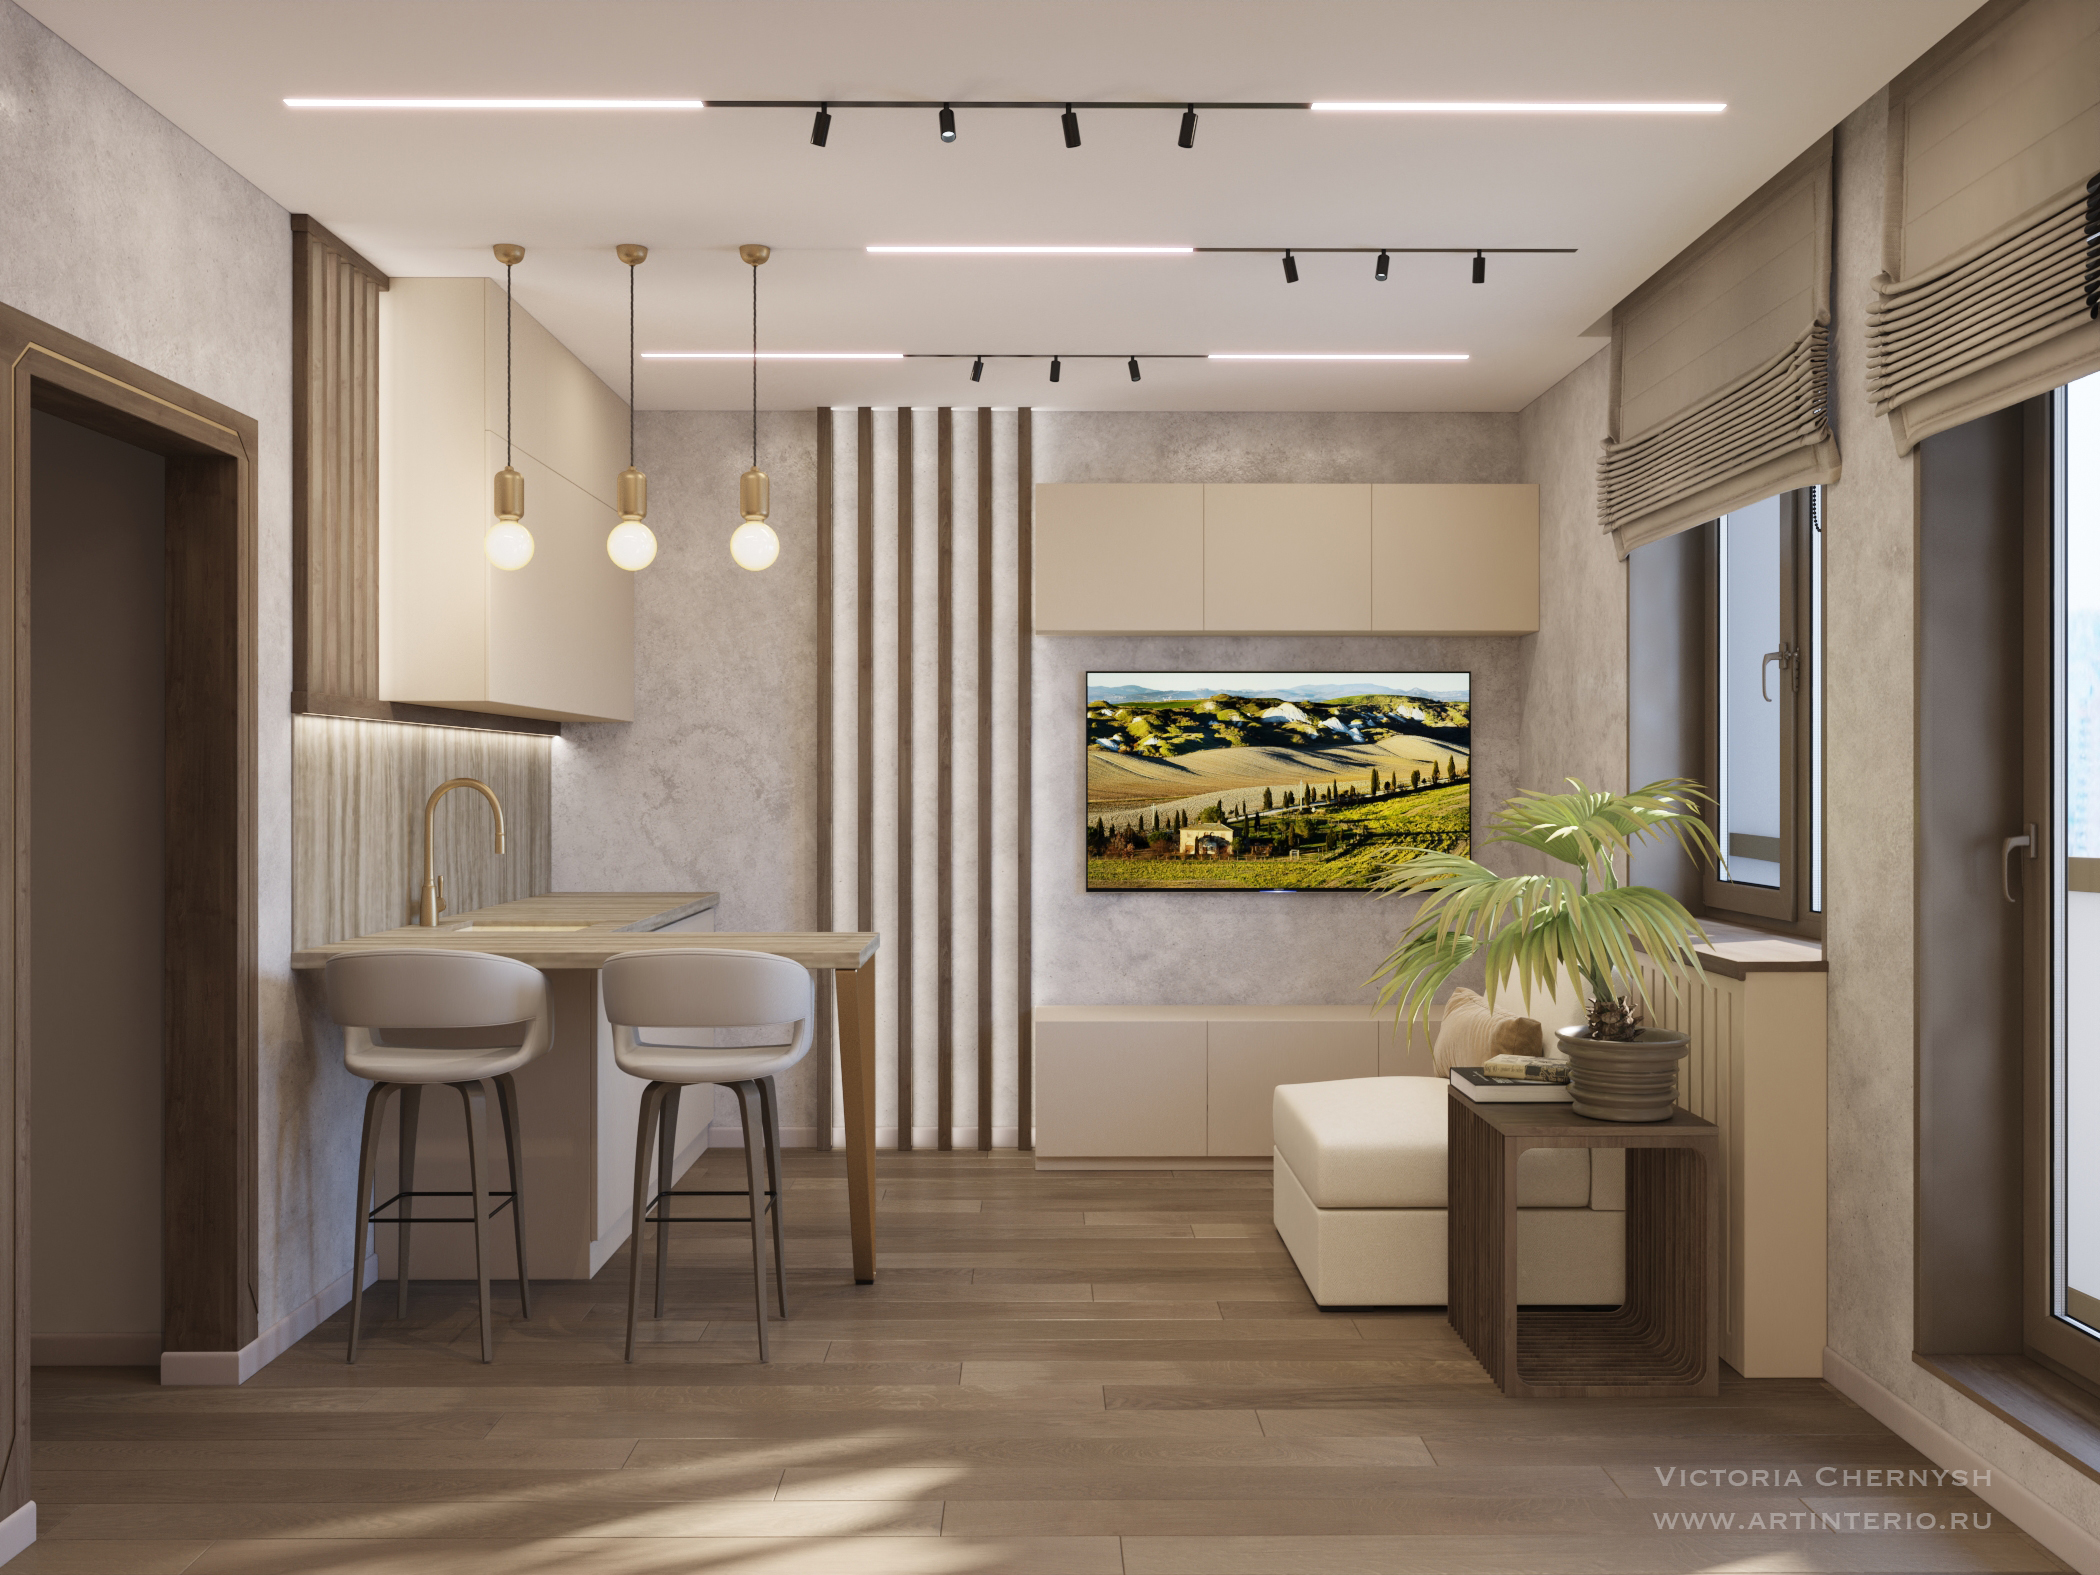 Дизайн интерьера квартиры-студии в Санкт-Петербурге